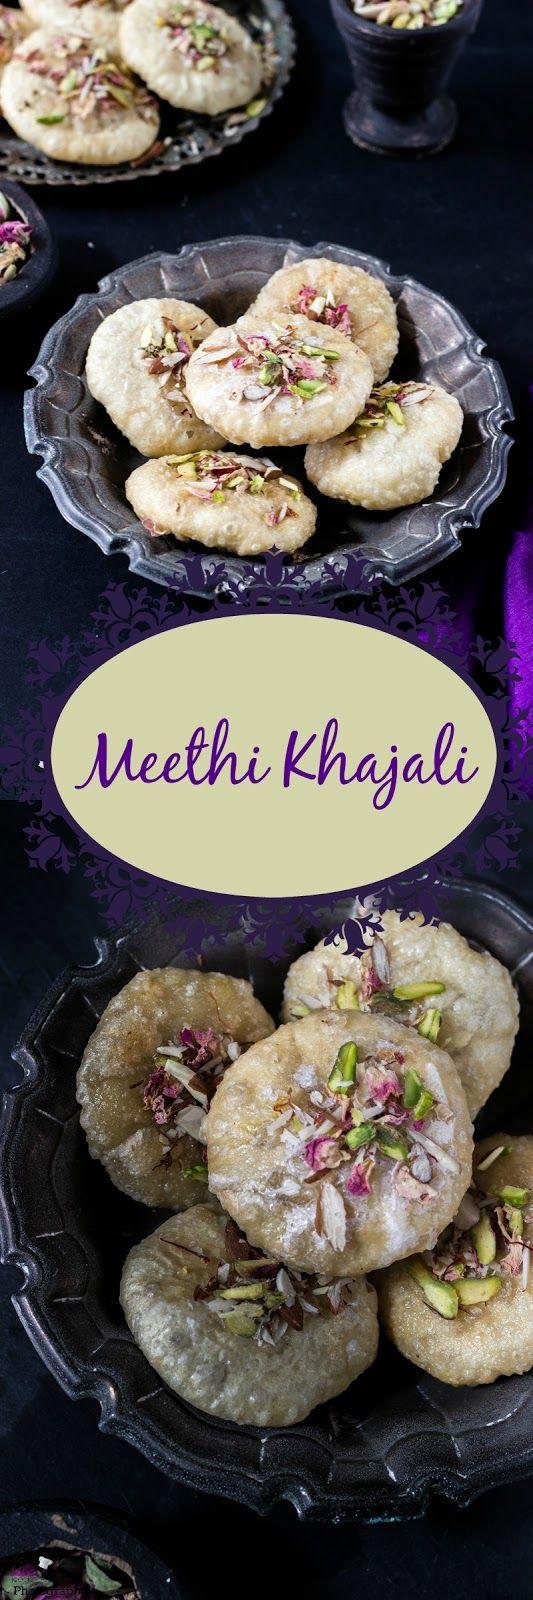 Jagruti's Cooking Odyssey: Meethi Khajali - Gujarati Style Sweet Flaky Fried Biscuits #Dusserhaspecial #Dashera #Vijayadashmi